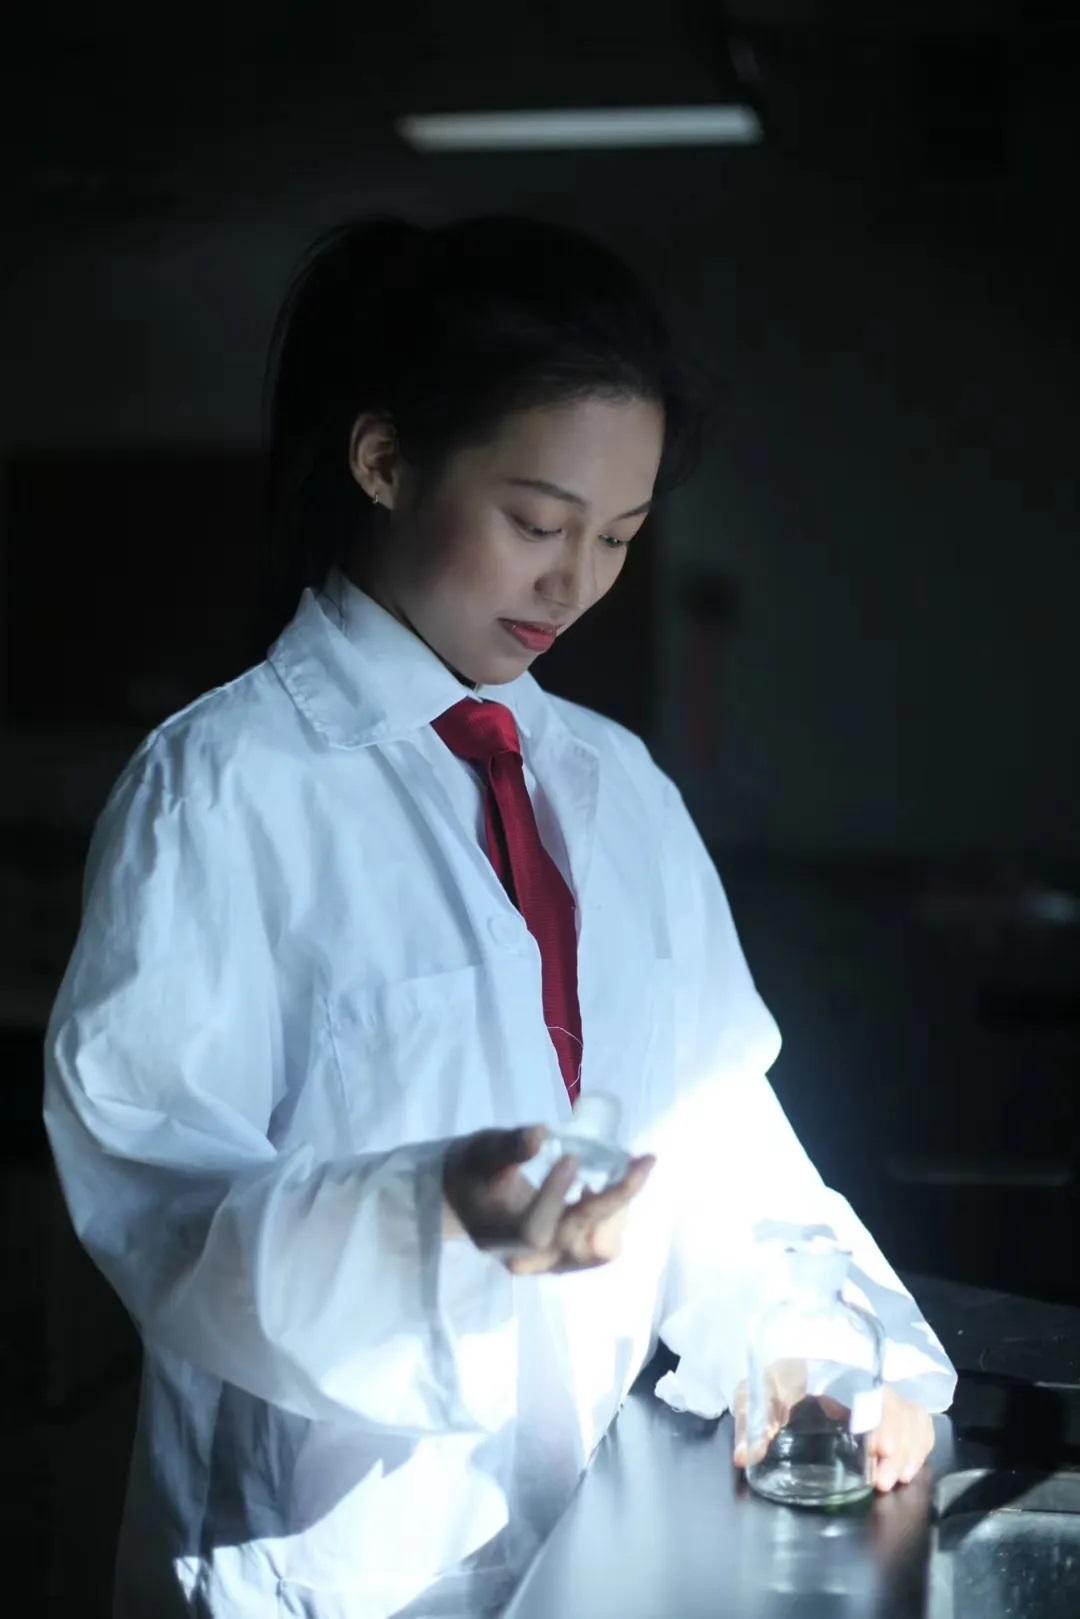 pearl-studying-science-珠海德威国际高中-20200904-163238-355